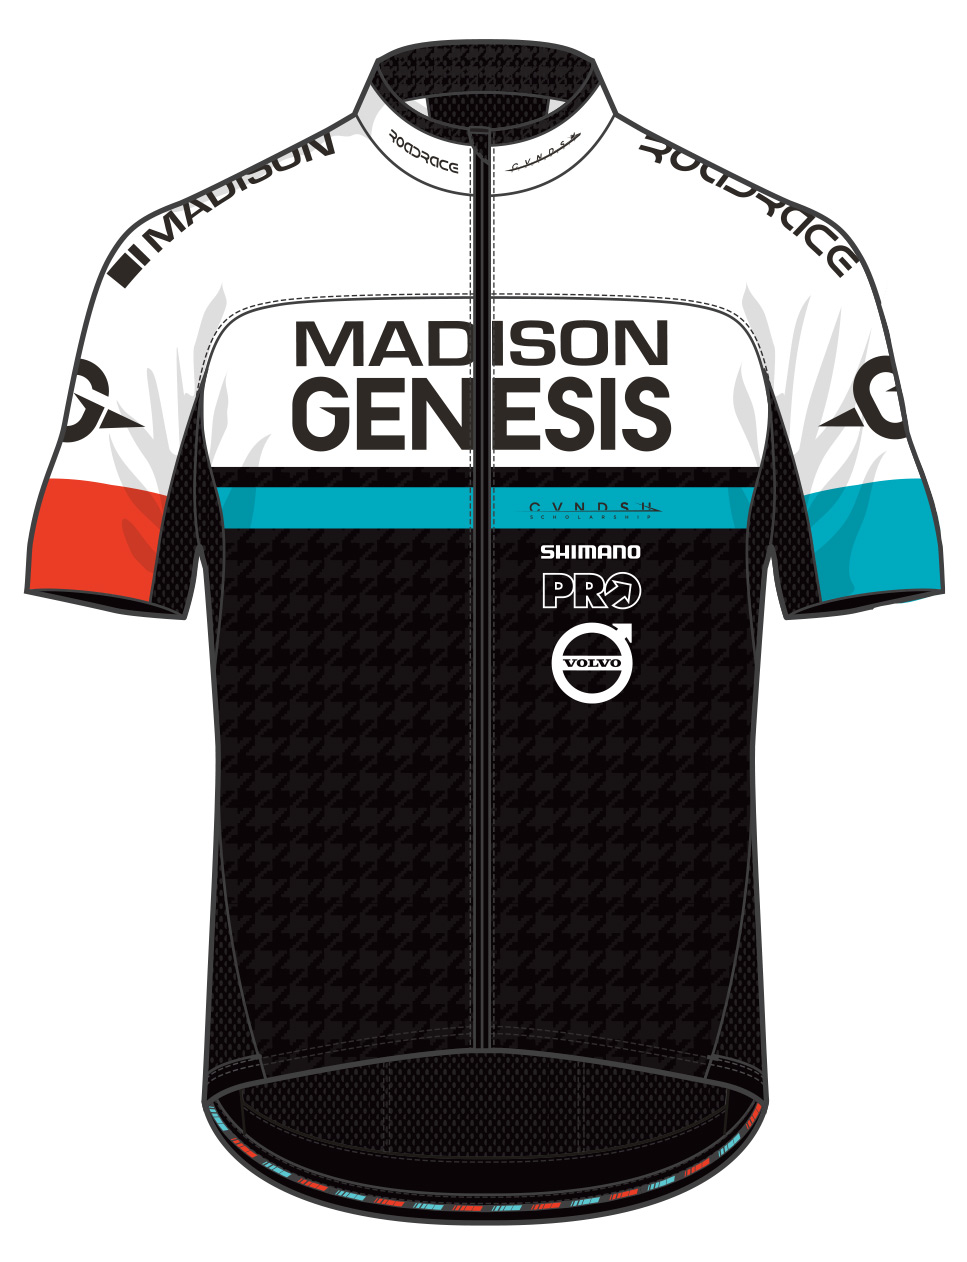 File Madison Genesis cycling team jersey 2017.jpg - Wikimedia Commons f4044b54a